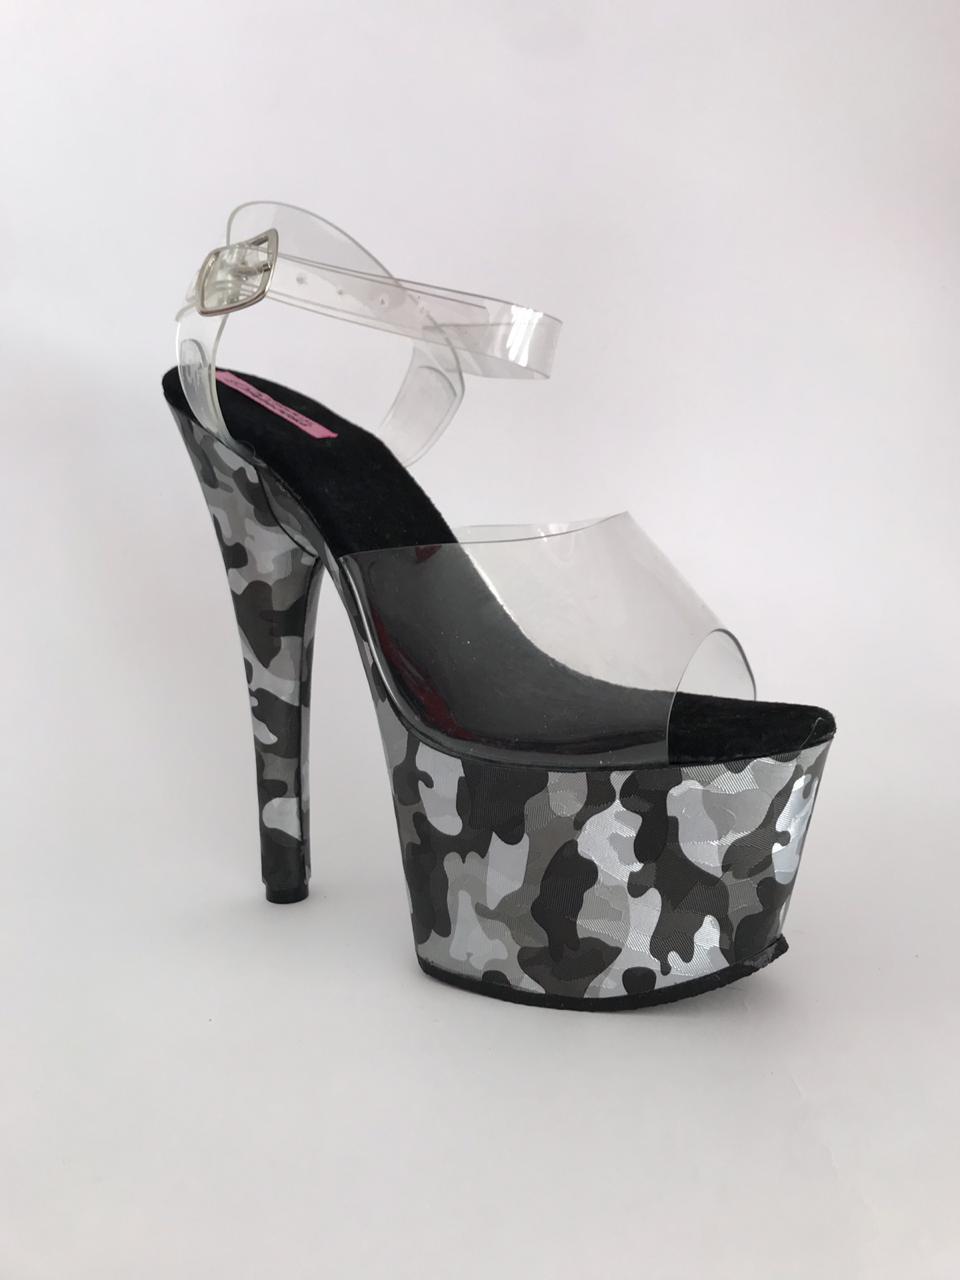 Zapato camuflaje, plataforma No.3